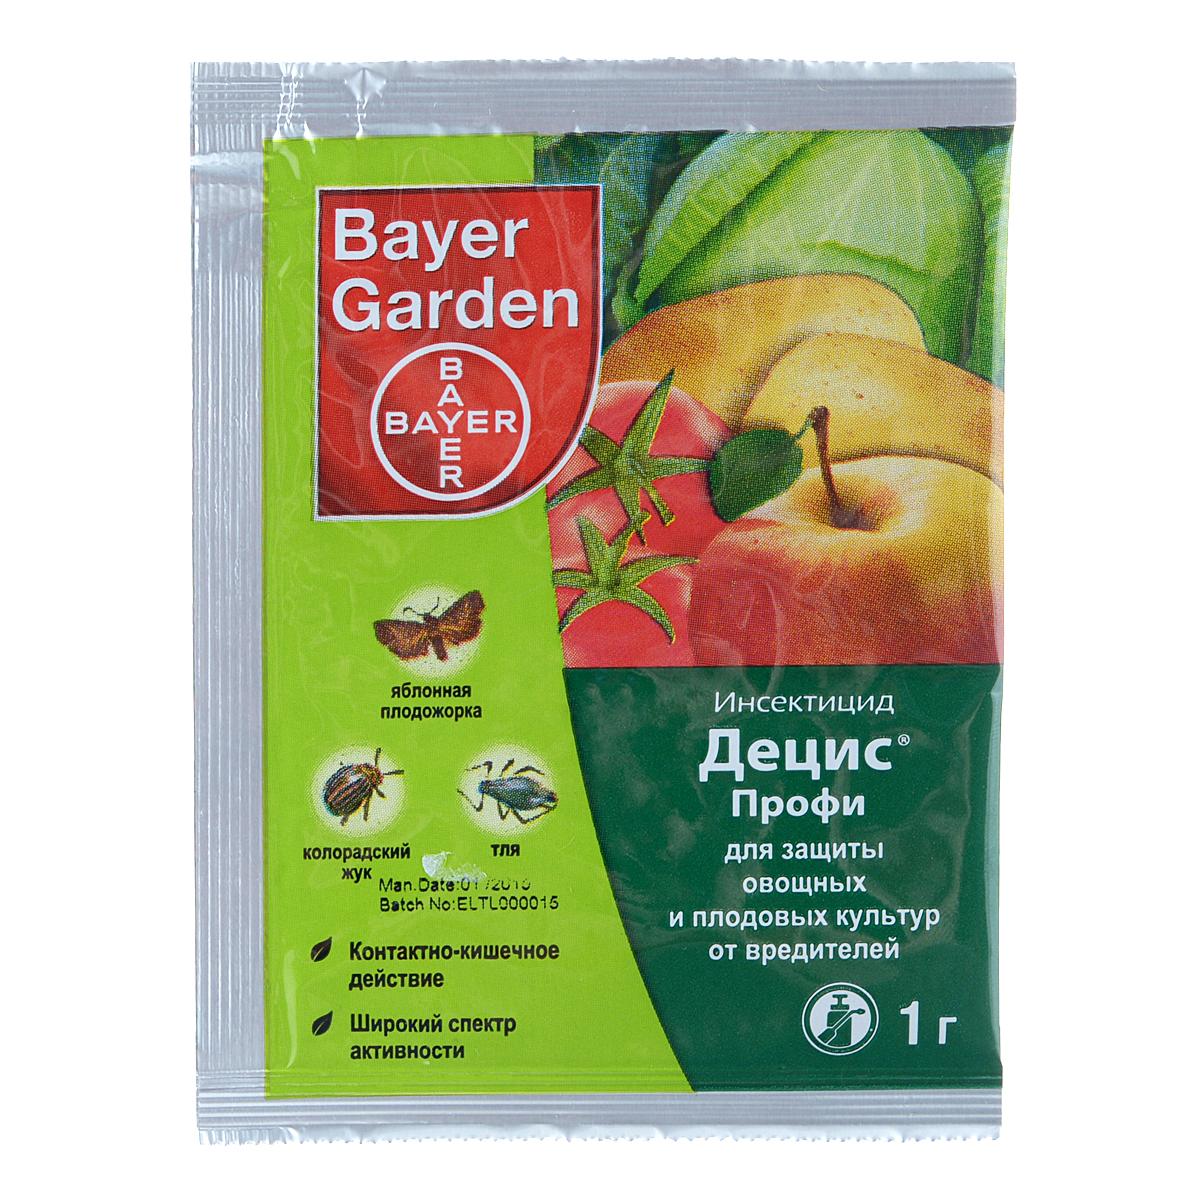 Инсектицид Bayer Garden